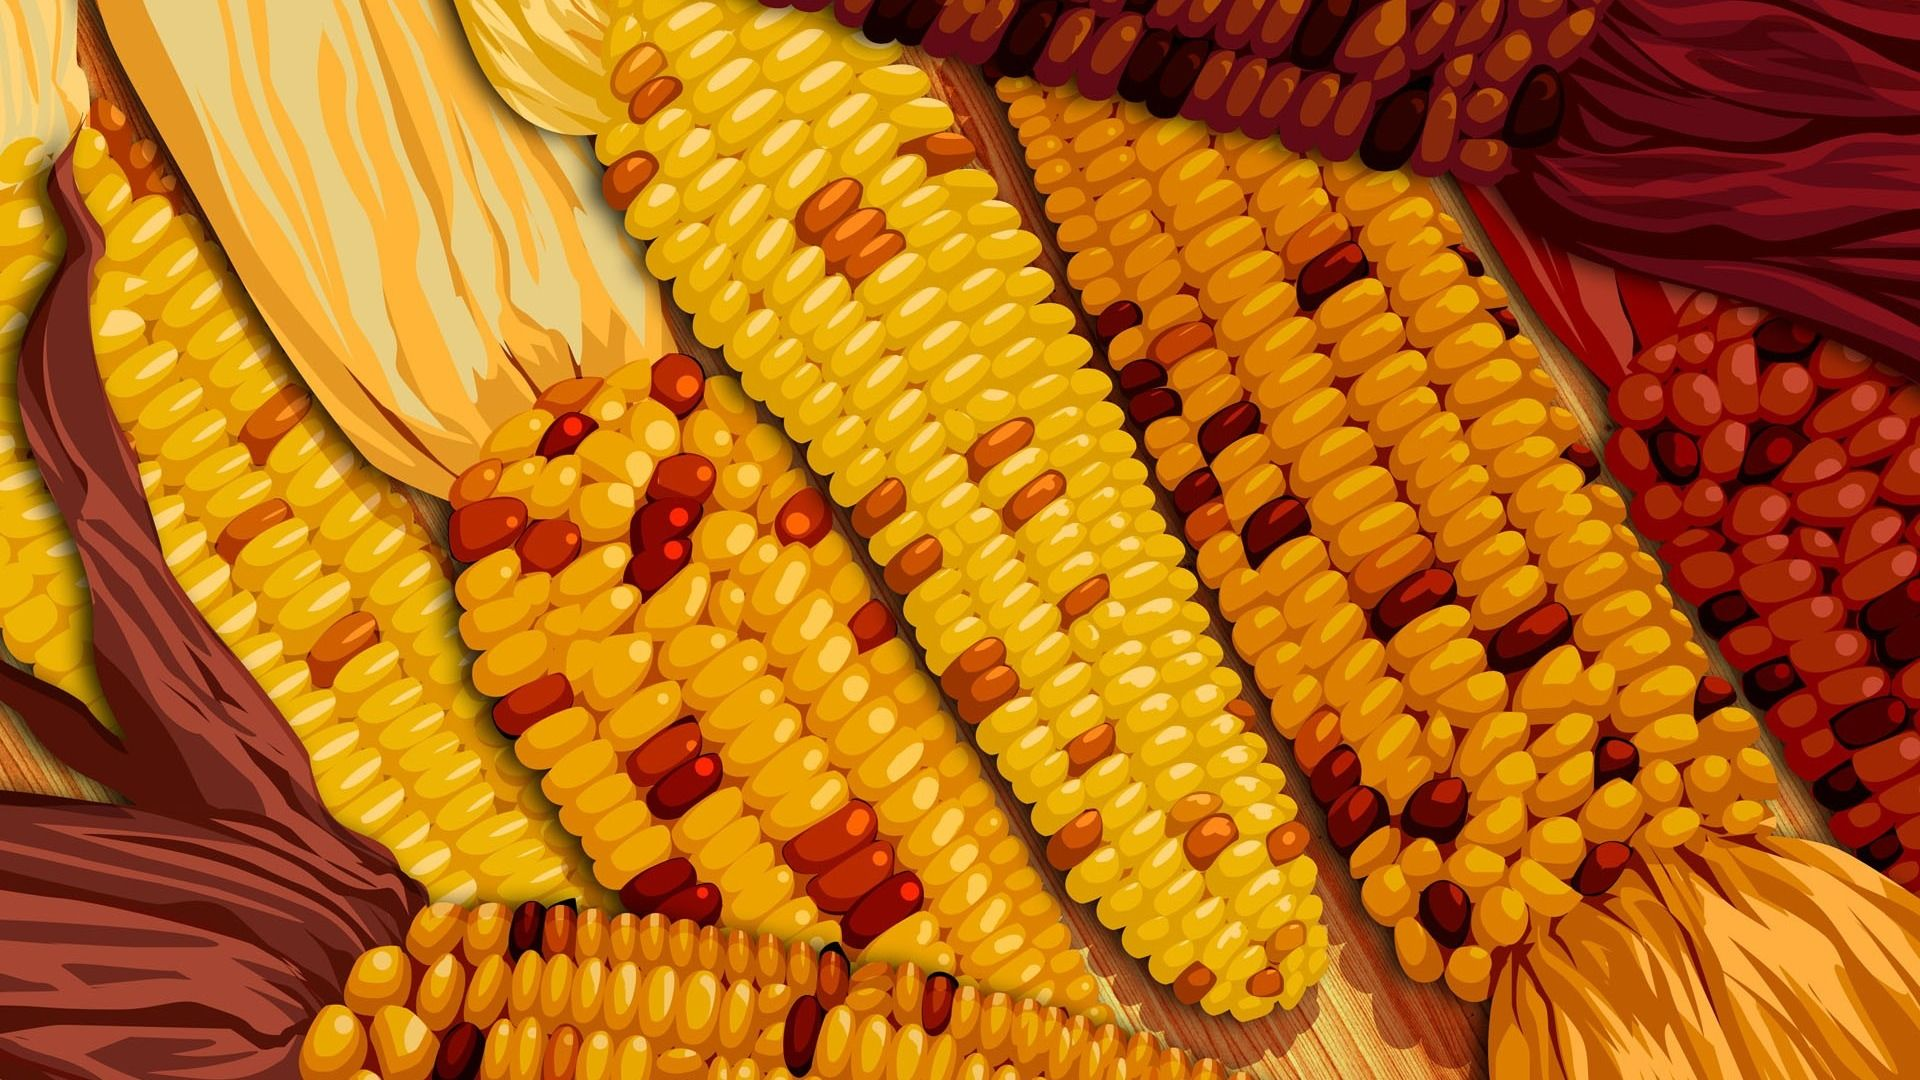 Corn 1080p Wallpaper